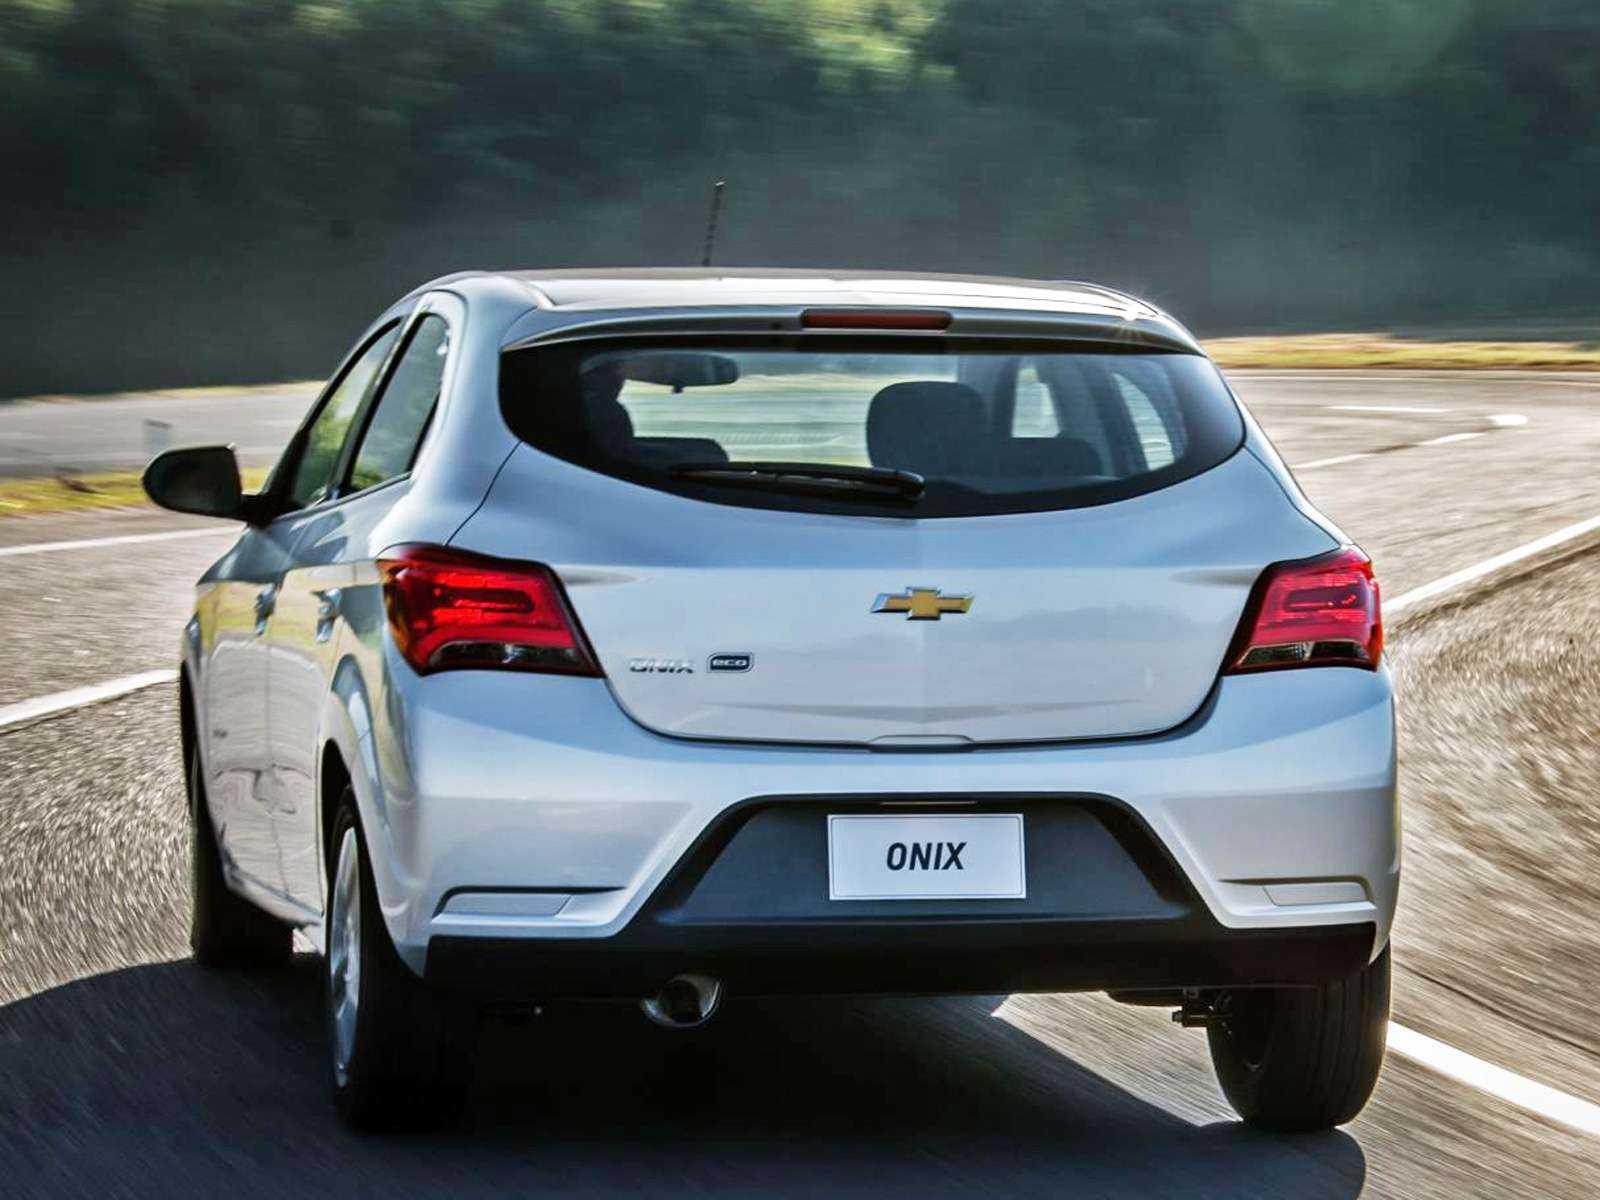 ChevroletOnix 2018 - ângulo traseiro